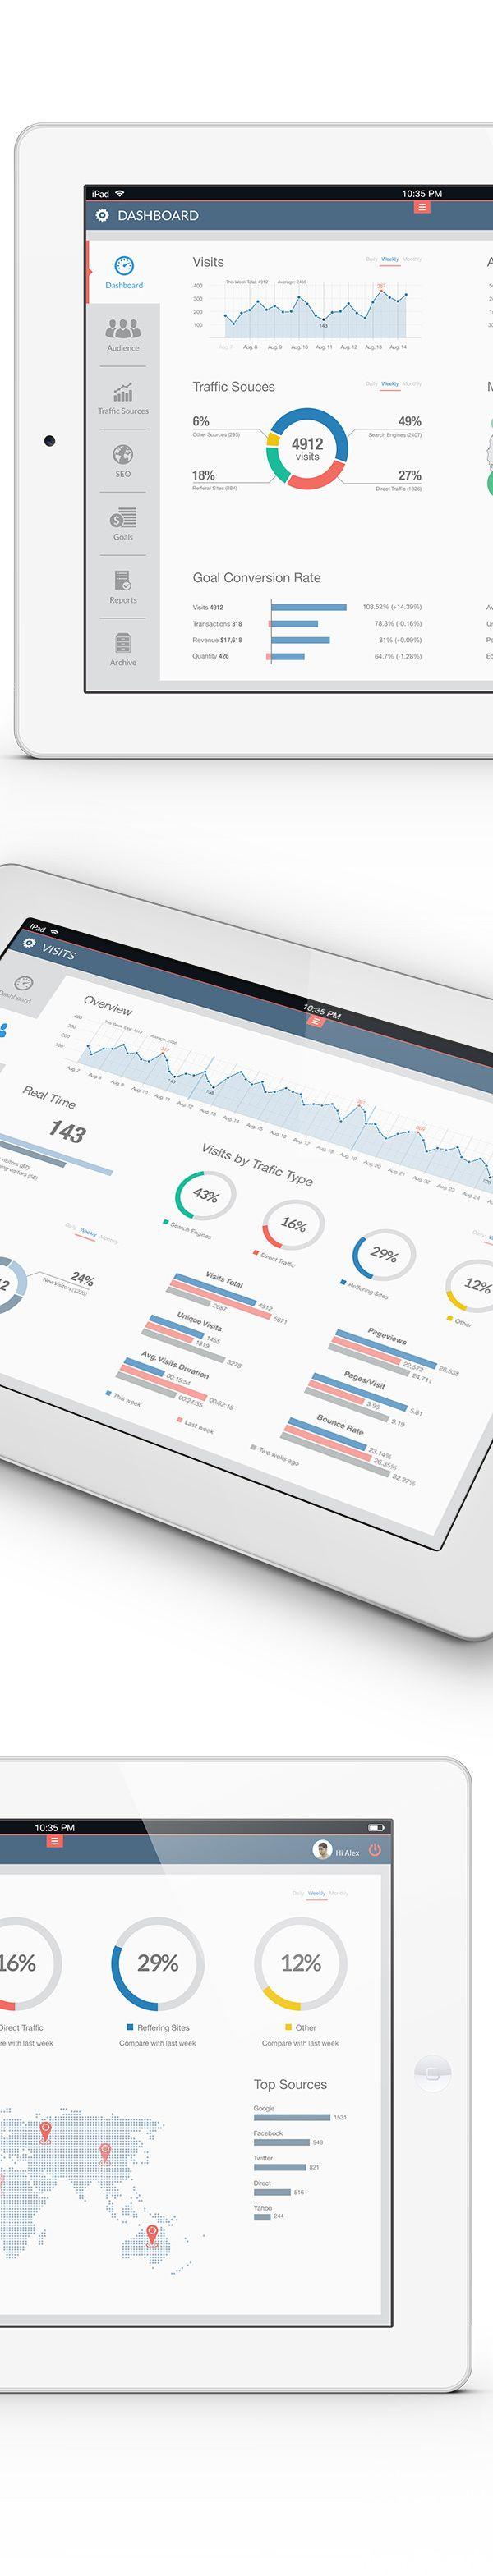 https://thoughtleadershipzen.blogspot.com/ #thoughtleadership Website Analytics App by Alex Tarloyan, via Behance